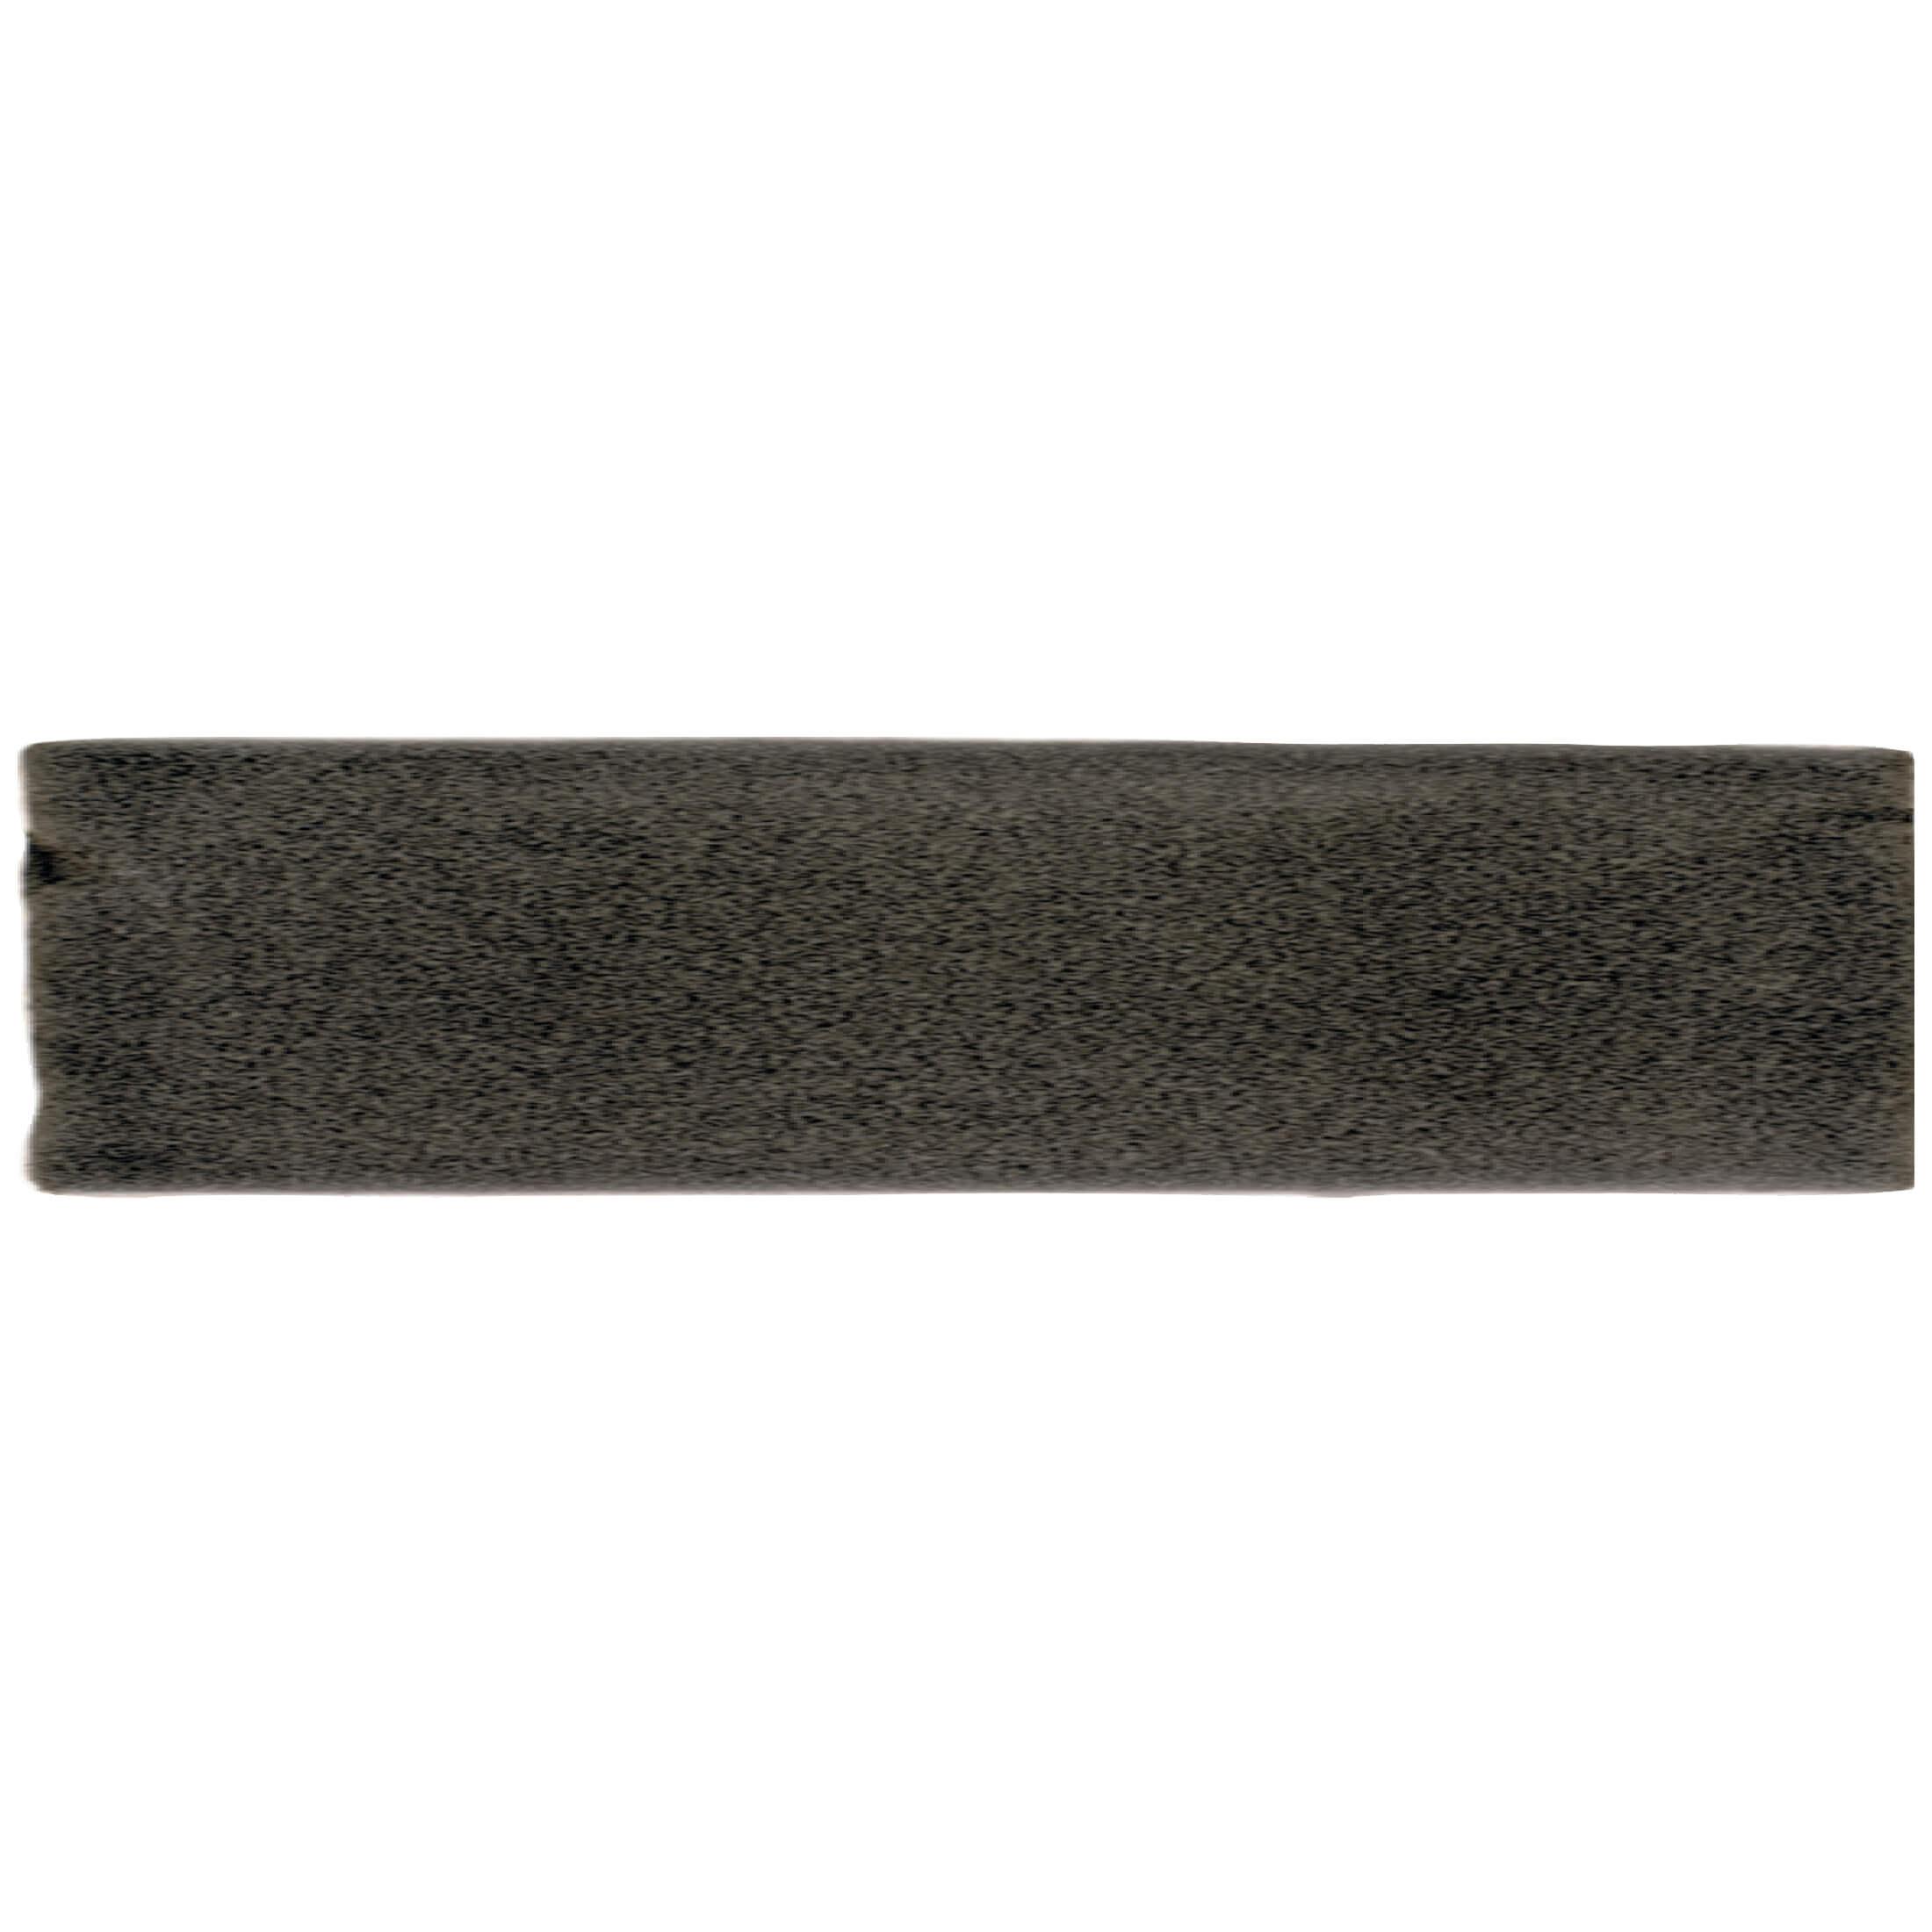 ADNT1018 - LISO  - 7.5 cm X 30 cm